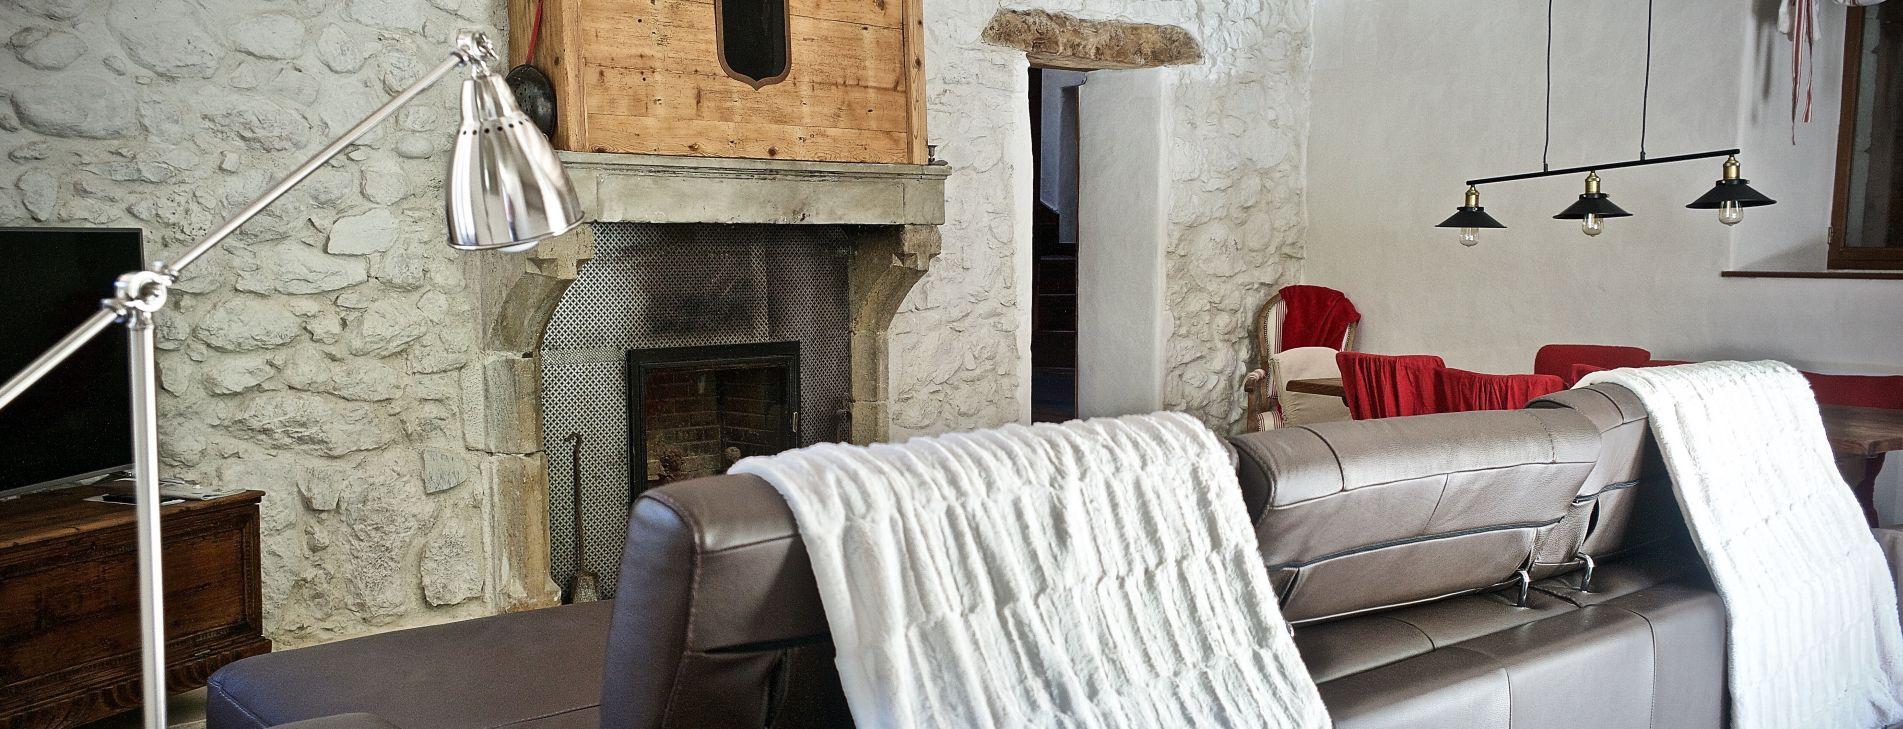 lodge cascade gite charme Aix les Bains